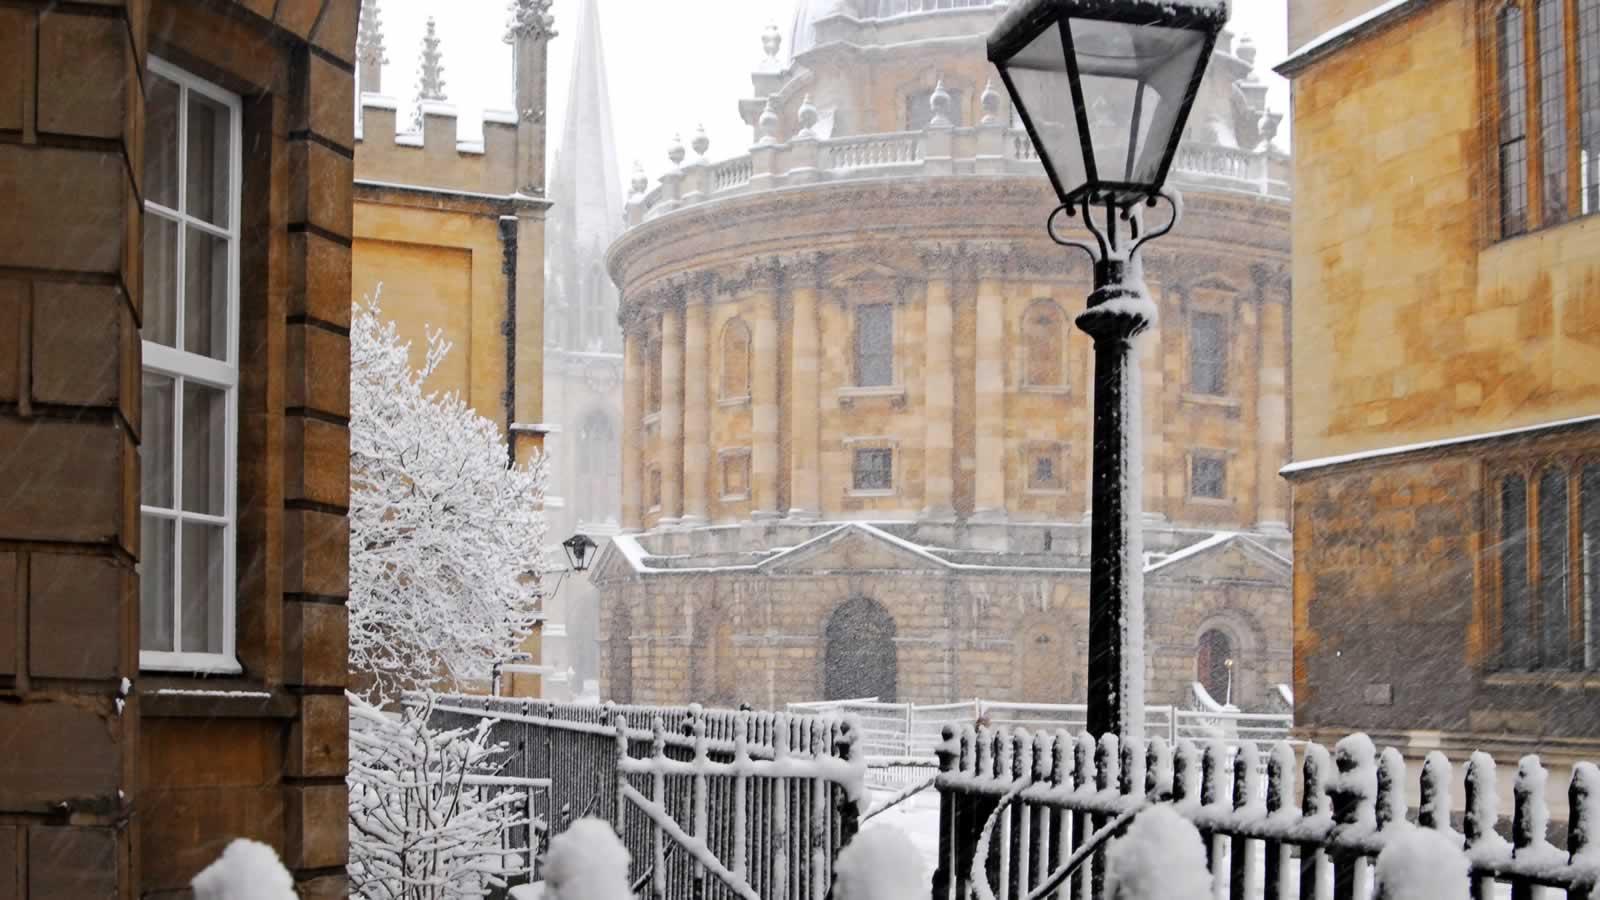 Snowy scenes in Oxford